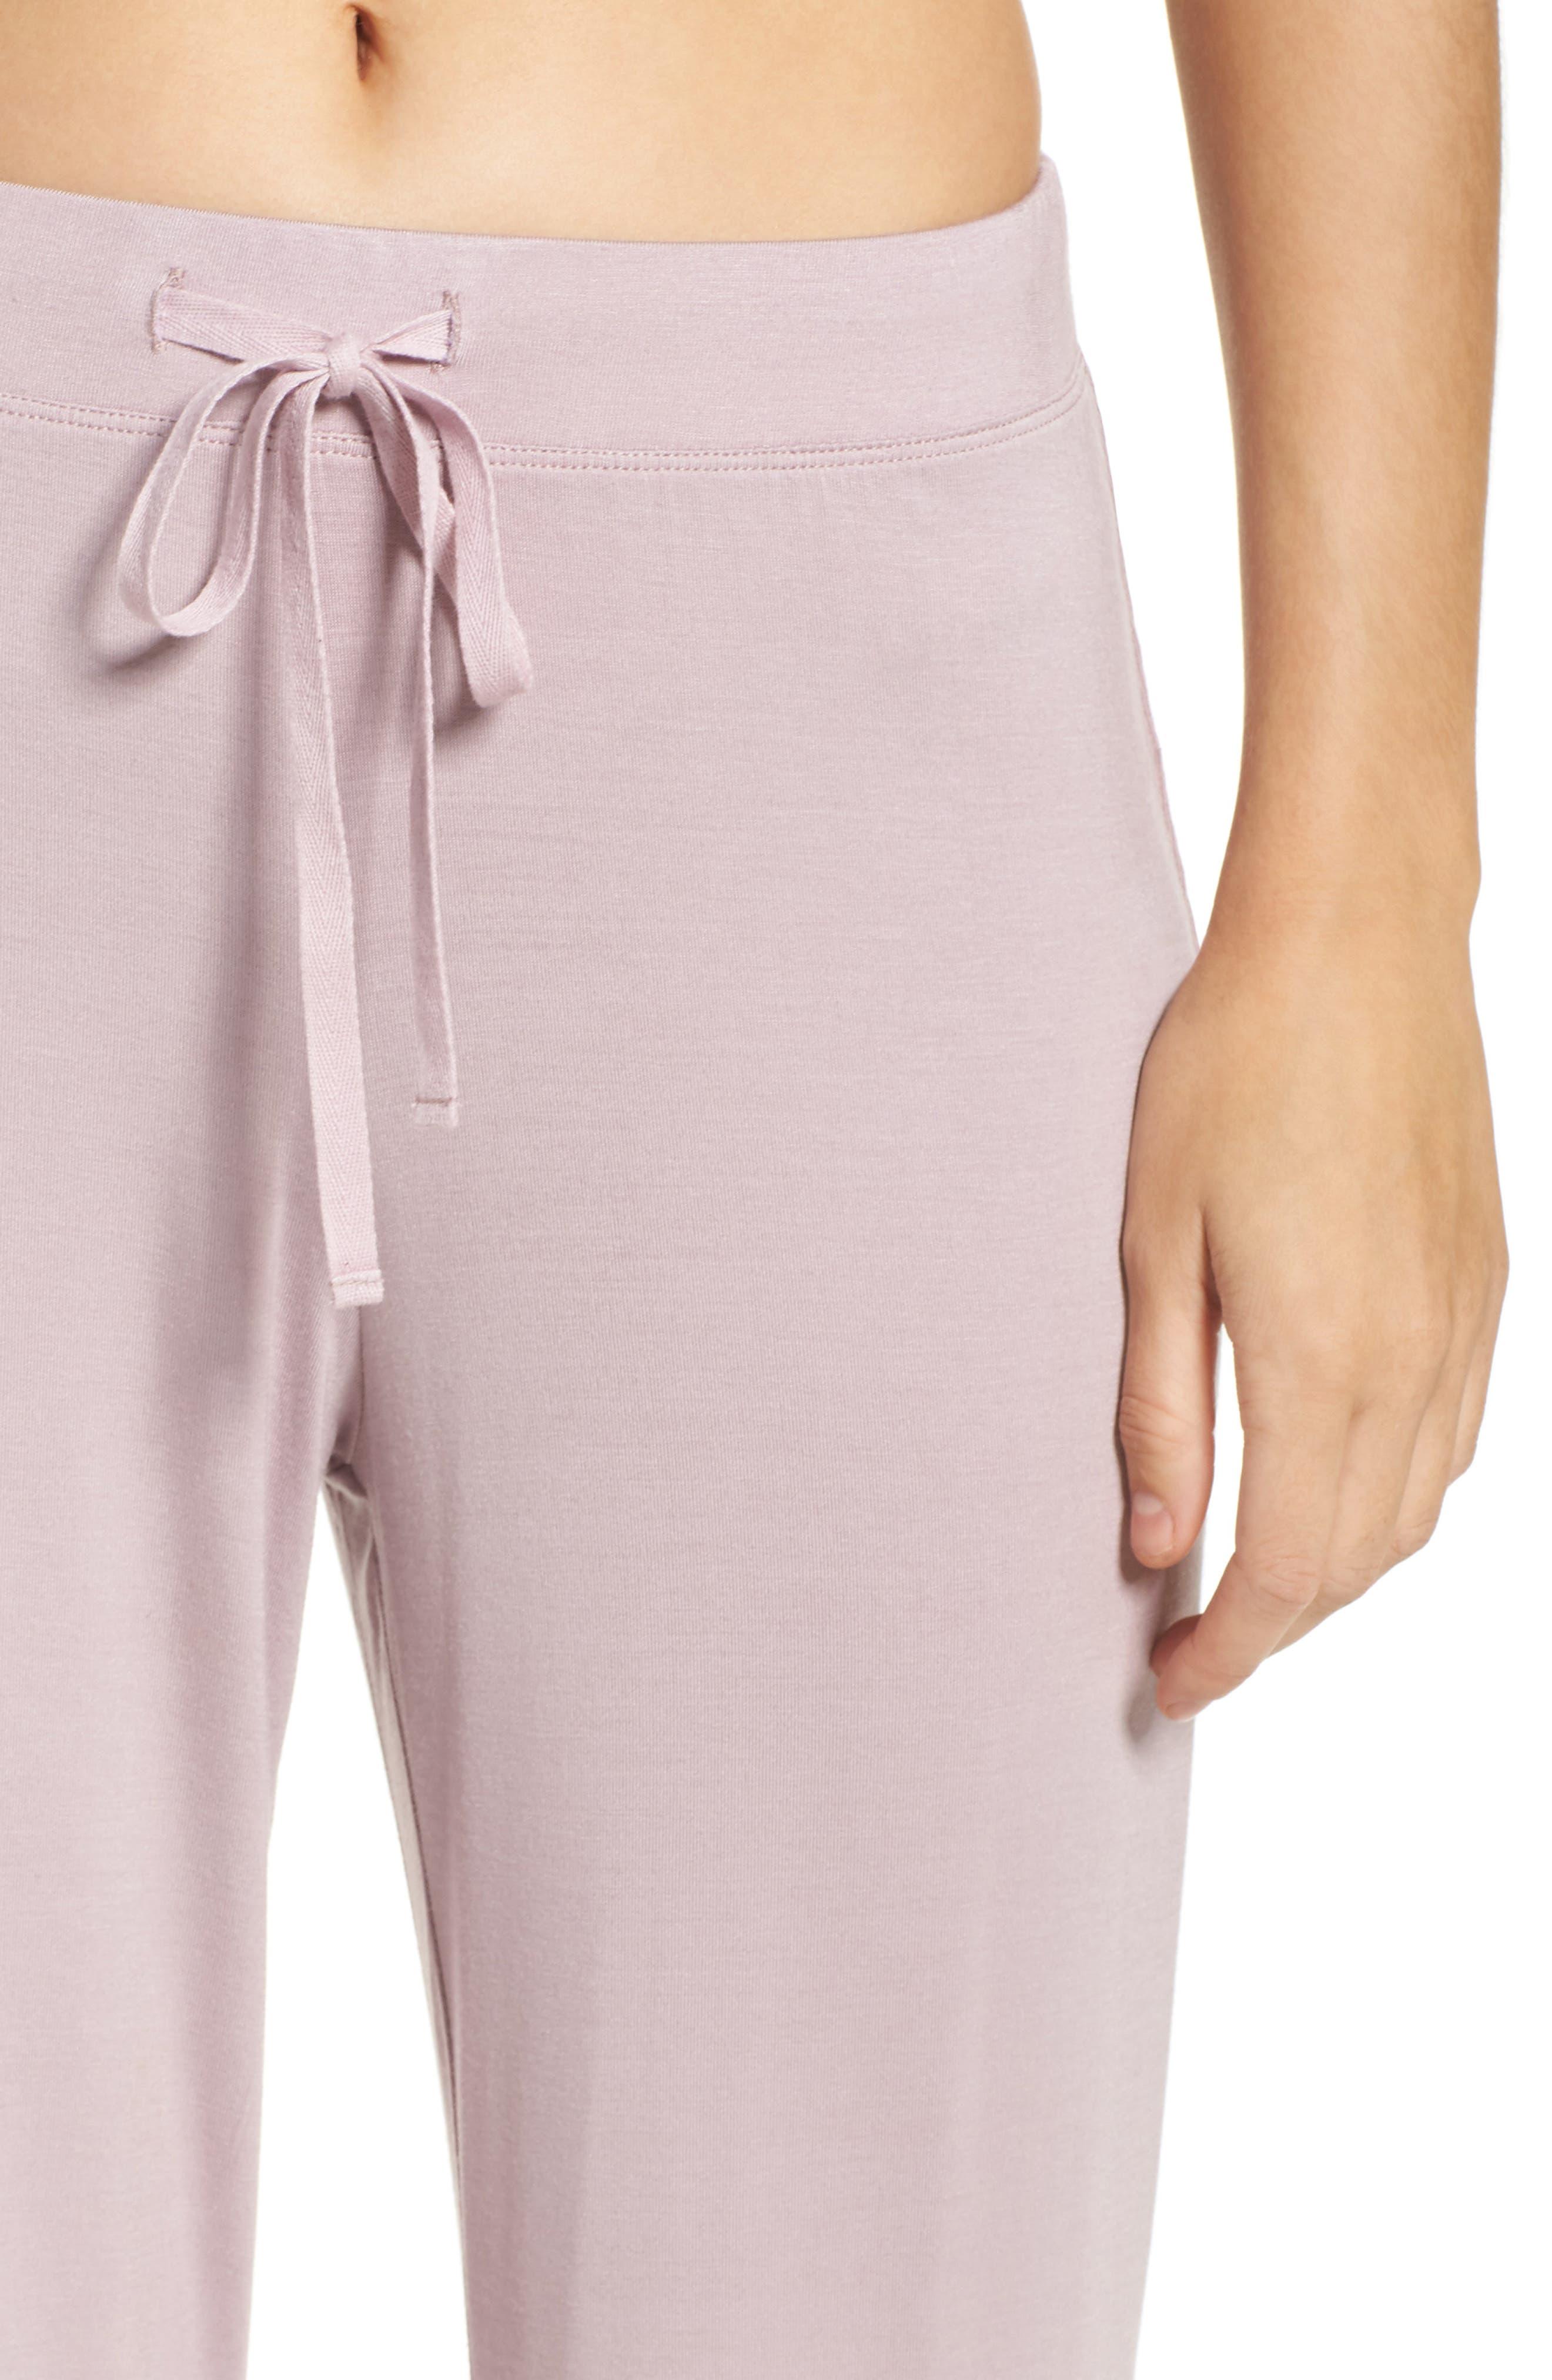 Polly Lounge Pants,                             Alternate thumbnail 4, color,                             650